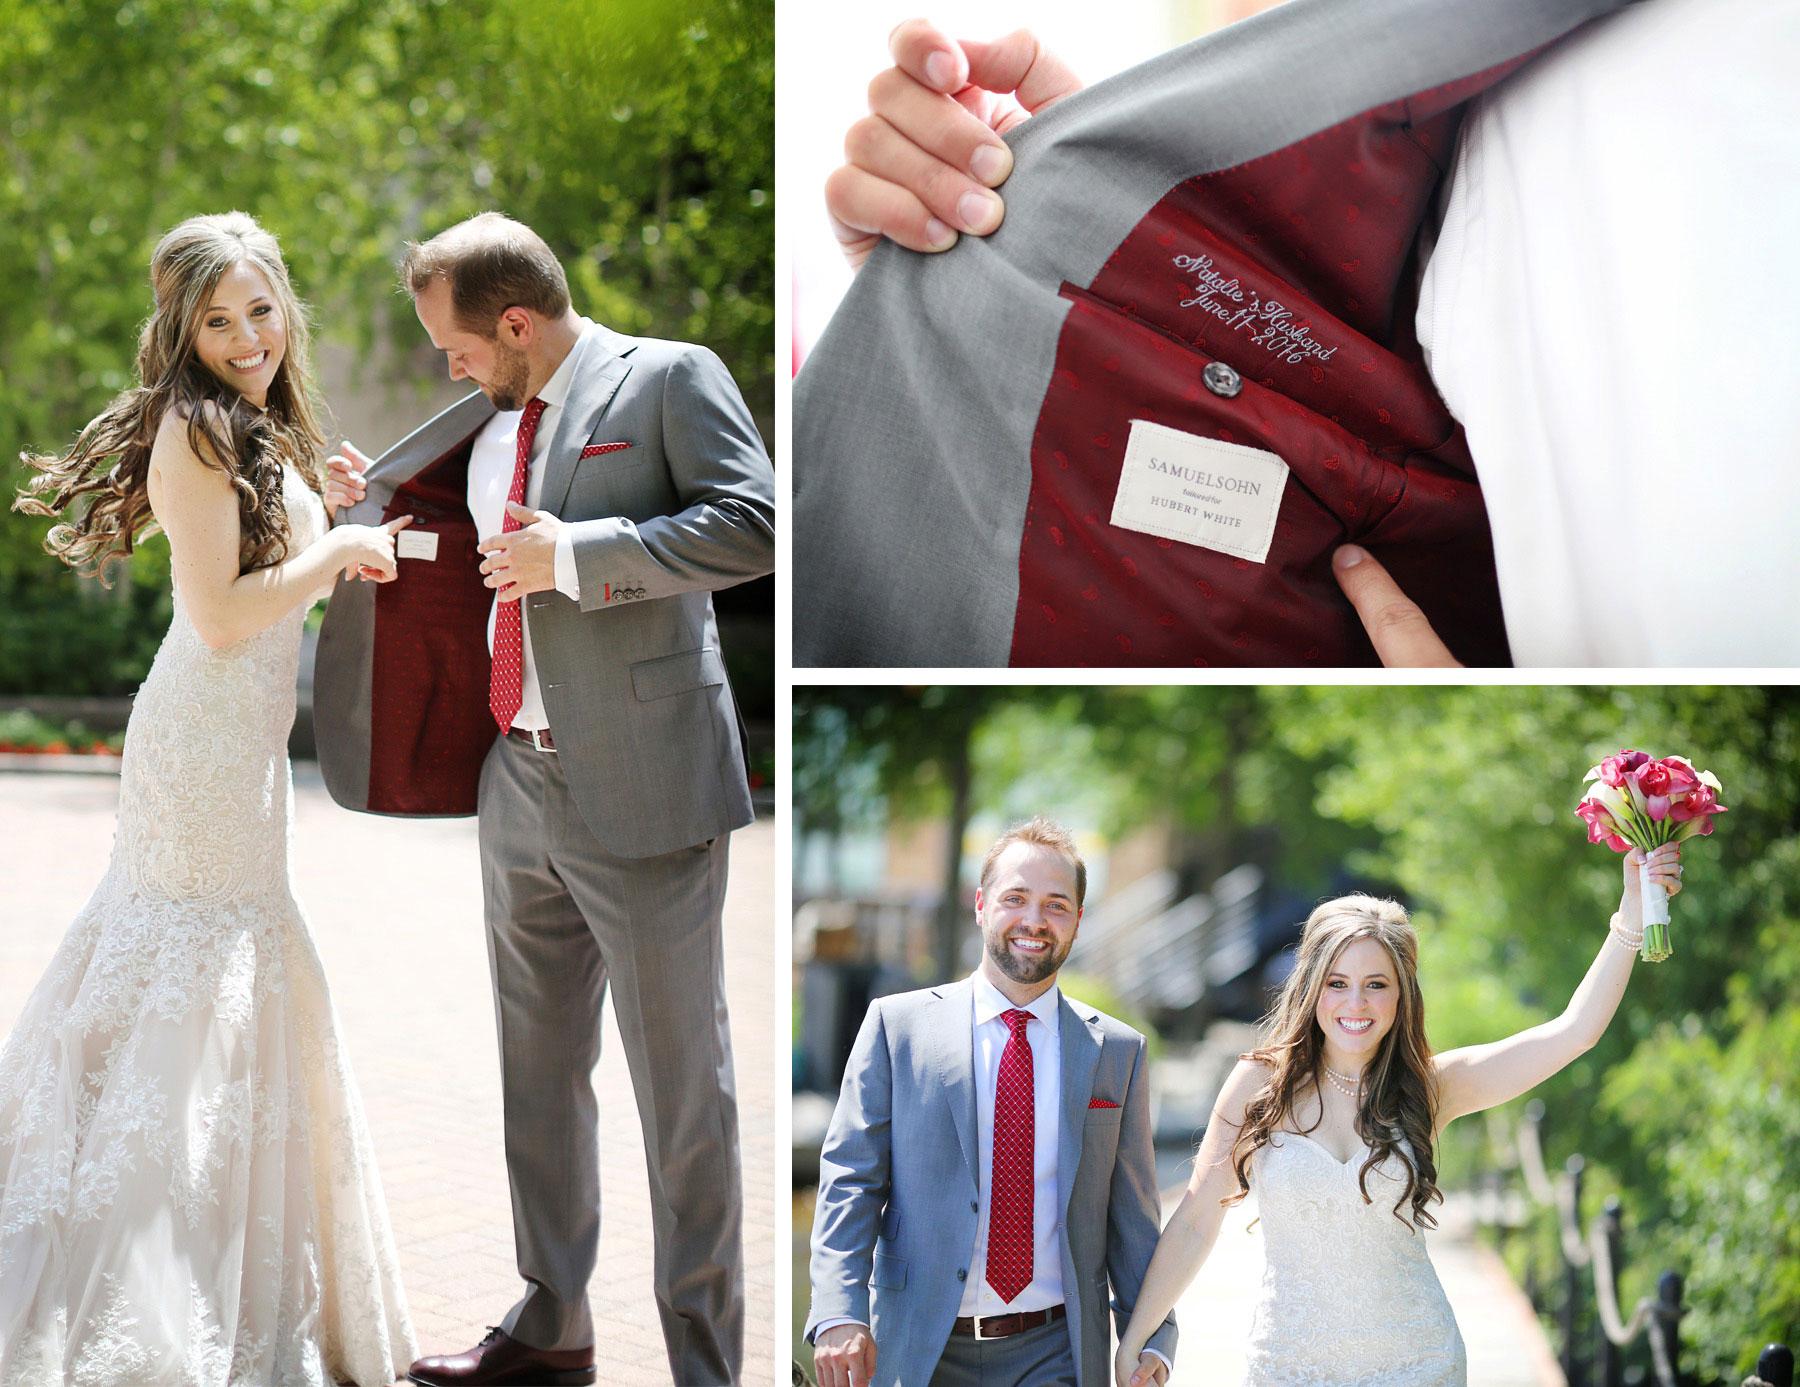 06-Minneapolis-Minnesota-Wedding-Photographer-by-Andrew-Vick-Photography-Summer-Edina-Westin-Hotel-Dess-Suit-Custom-Embroidery-Samuelsohn-Hubert-White-Flowers-Bride-Groom-Natalie-and-Andrew.jpg